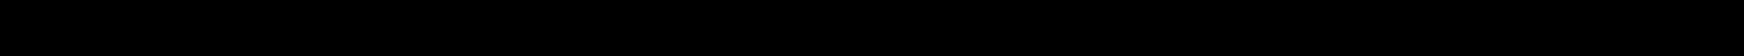 NeutraDisplay-LightAlt.otf